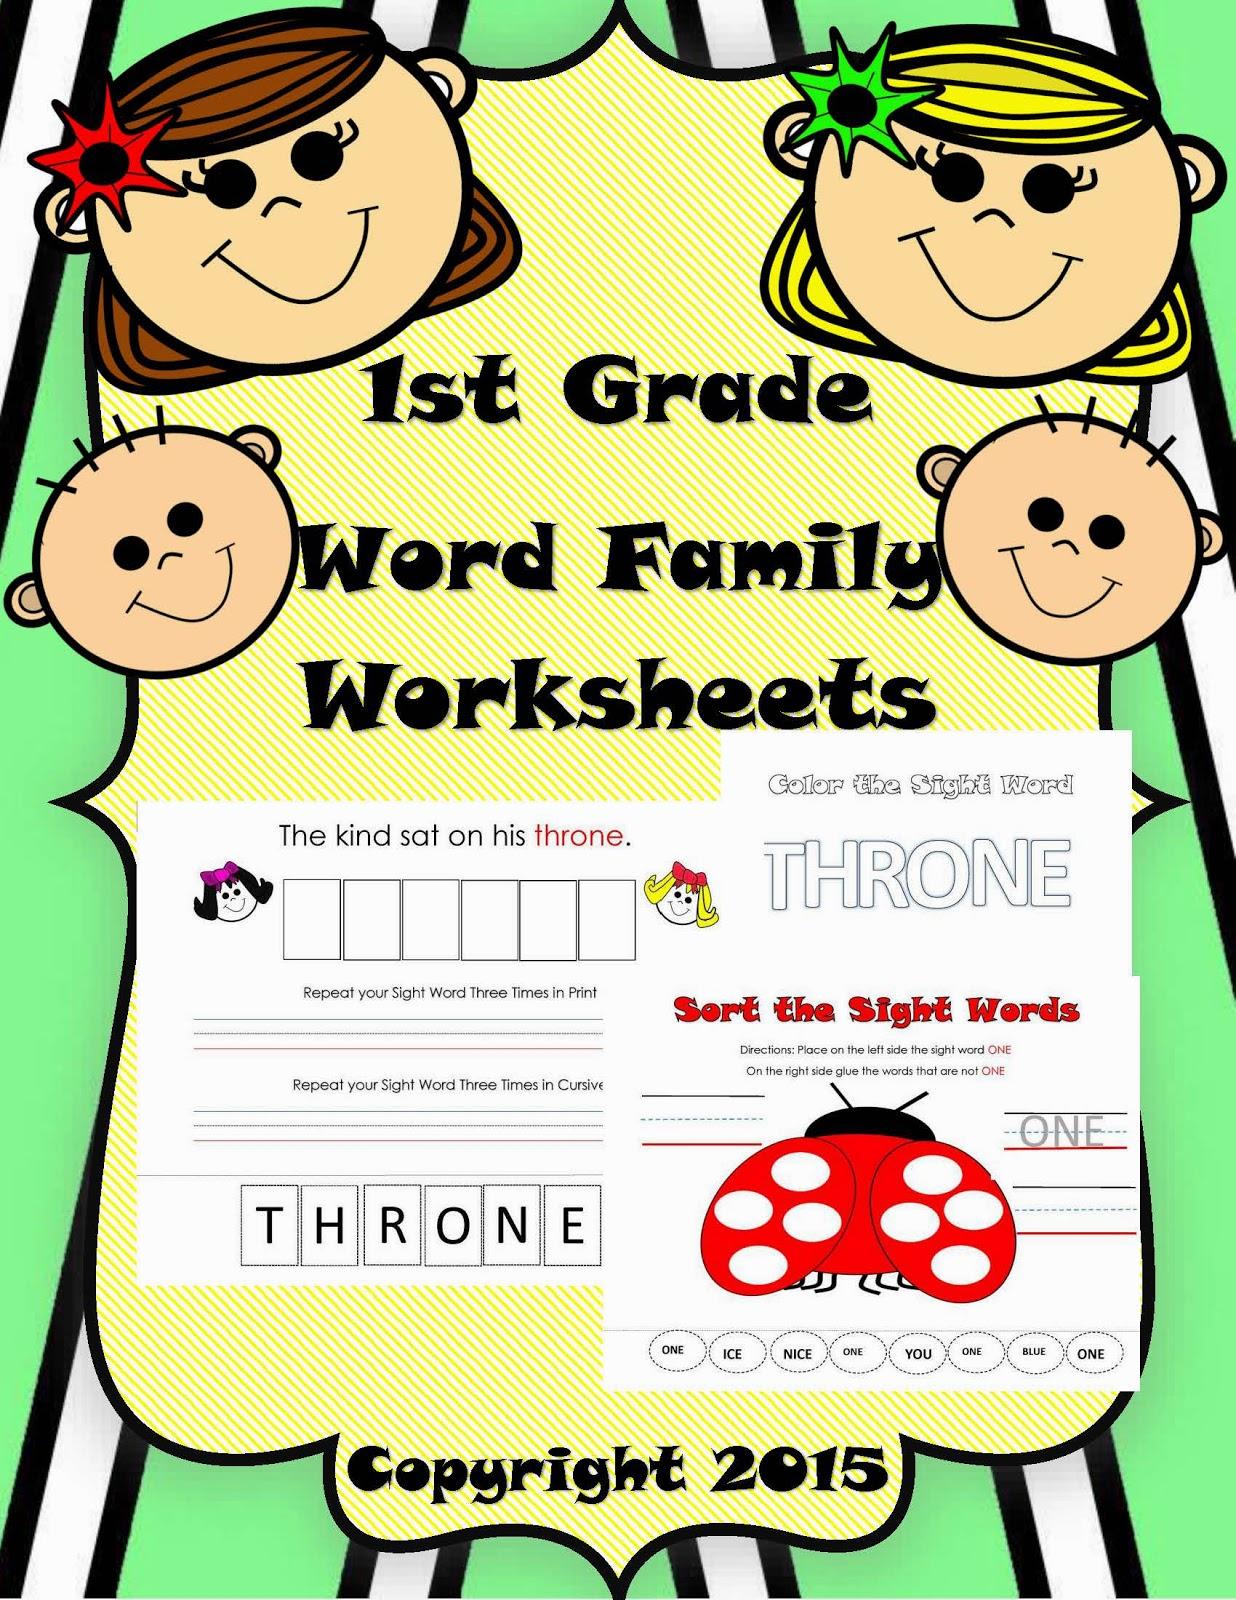 The Hermit Crabs Homeschool 1st Grade Word Family